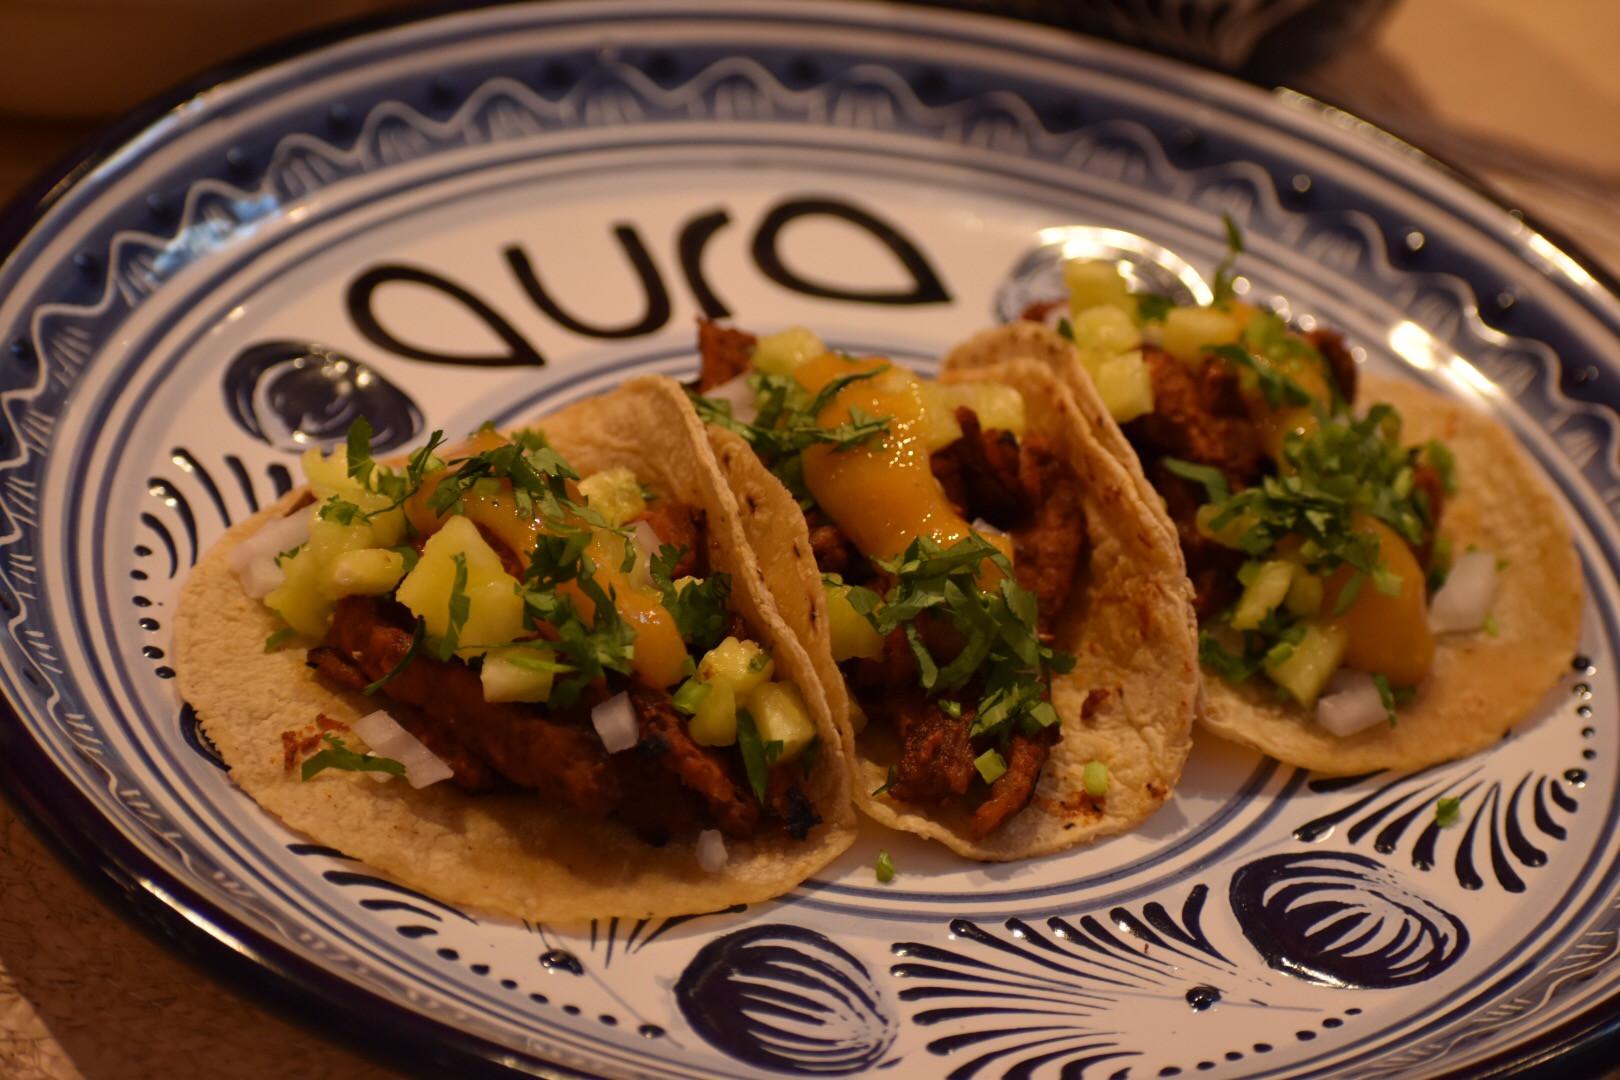 Aura Cocina Mexicana | Cooking Class | Mexico City | Mexican Street Tacos hands-on Cooking Class | Taco al Pastor